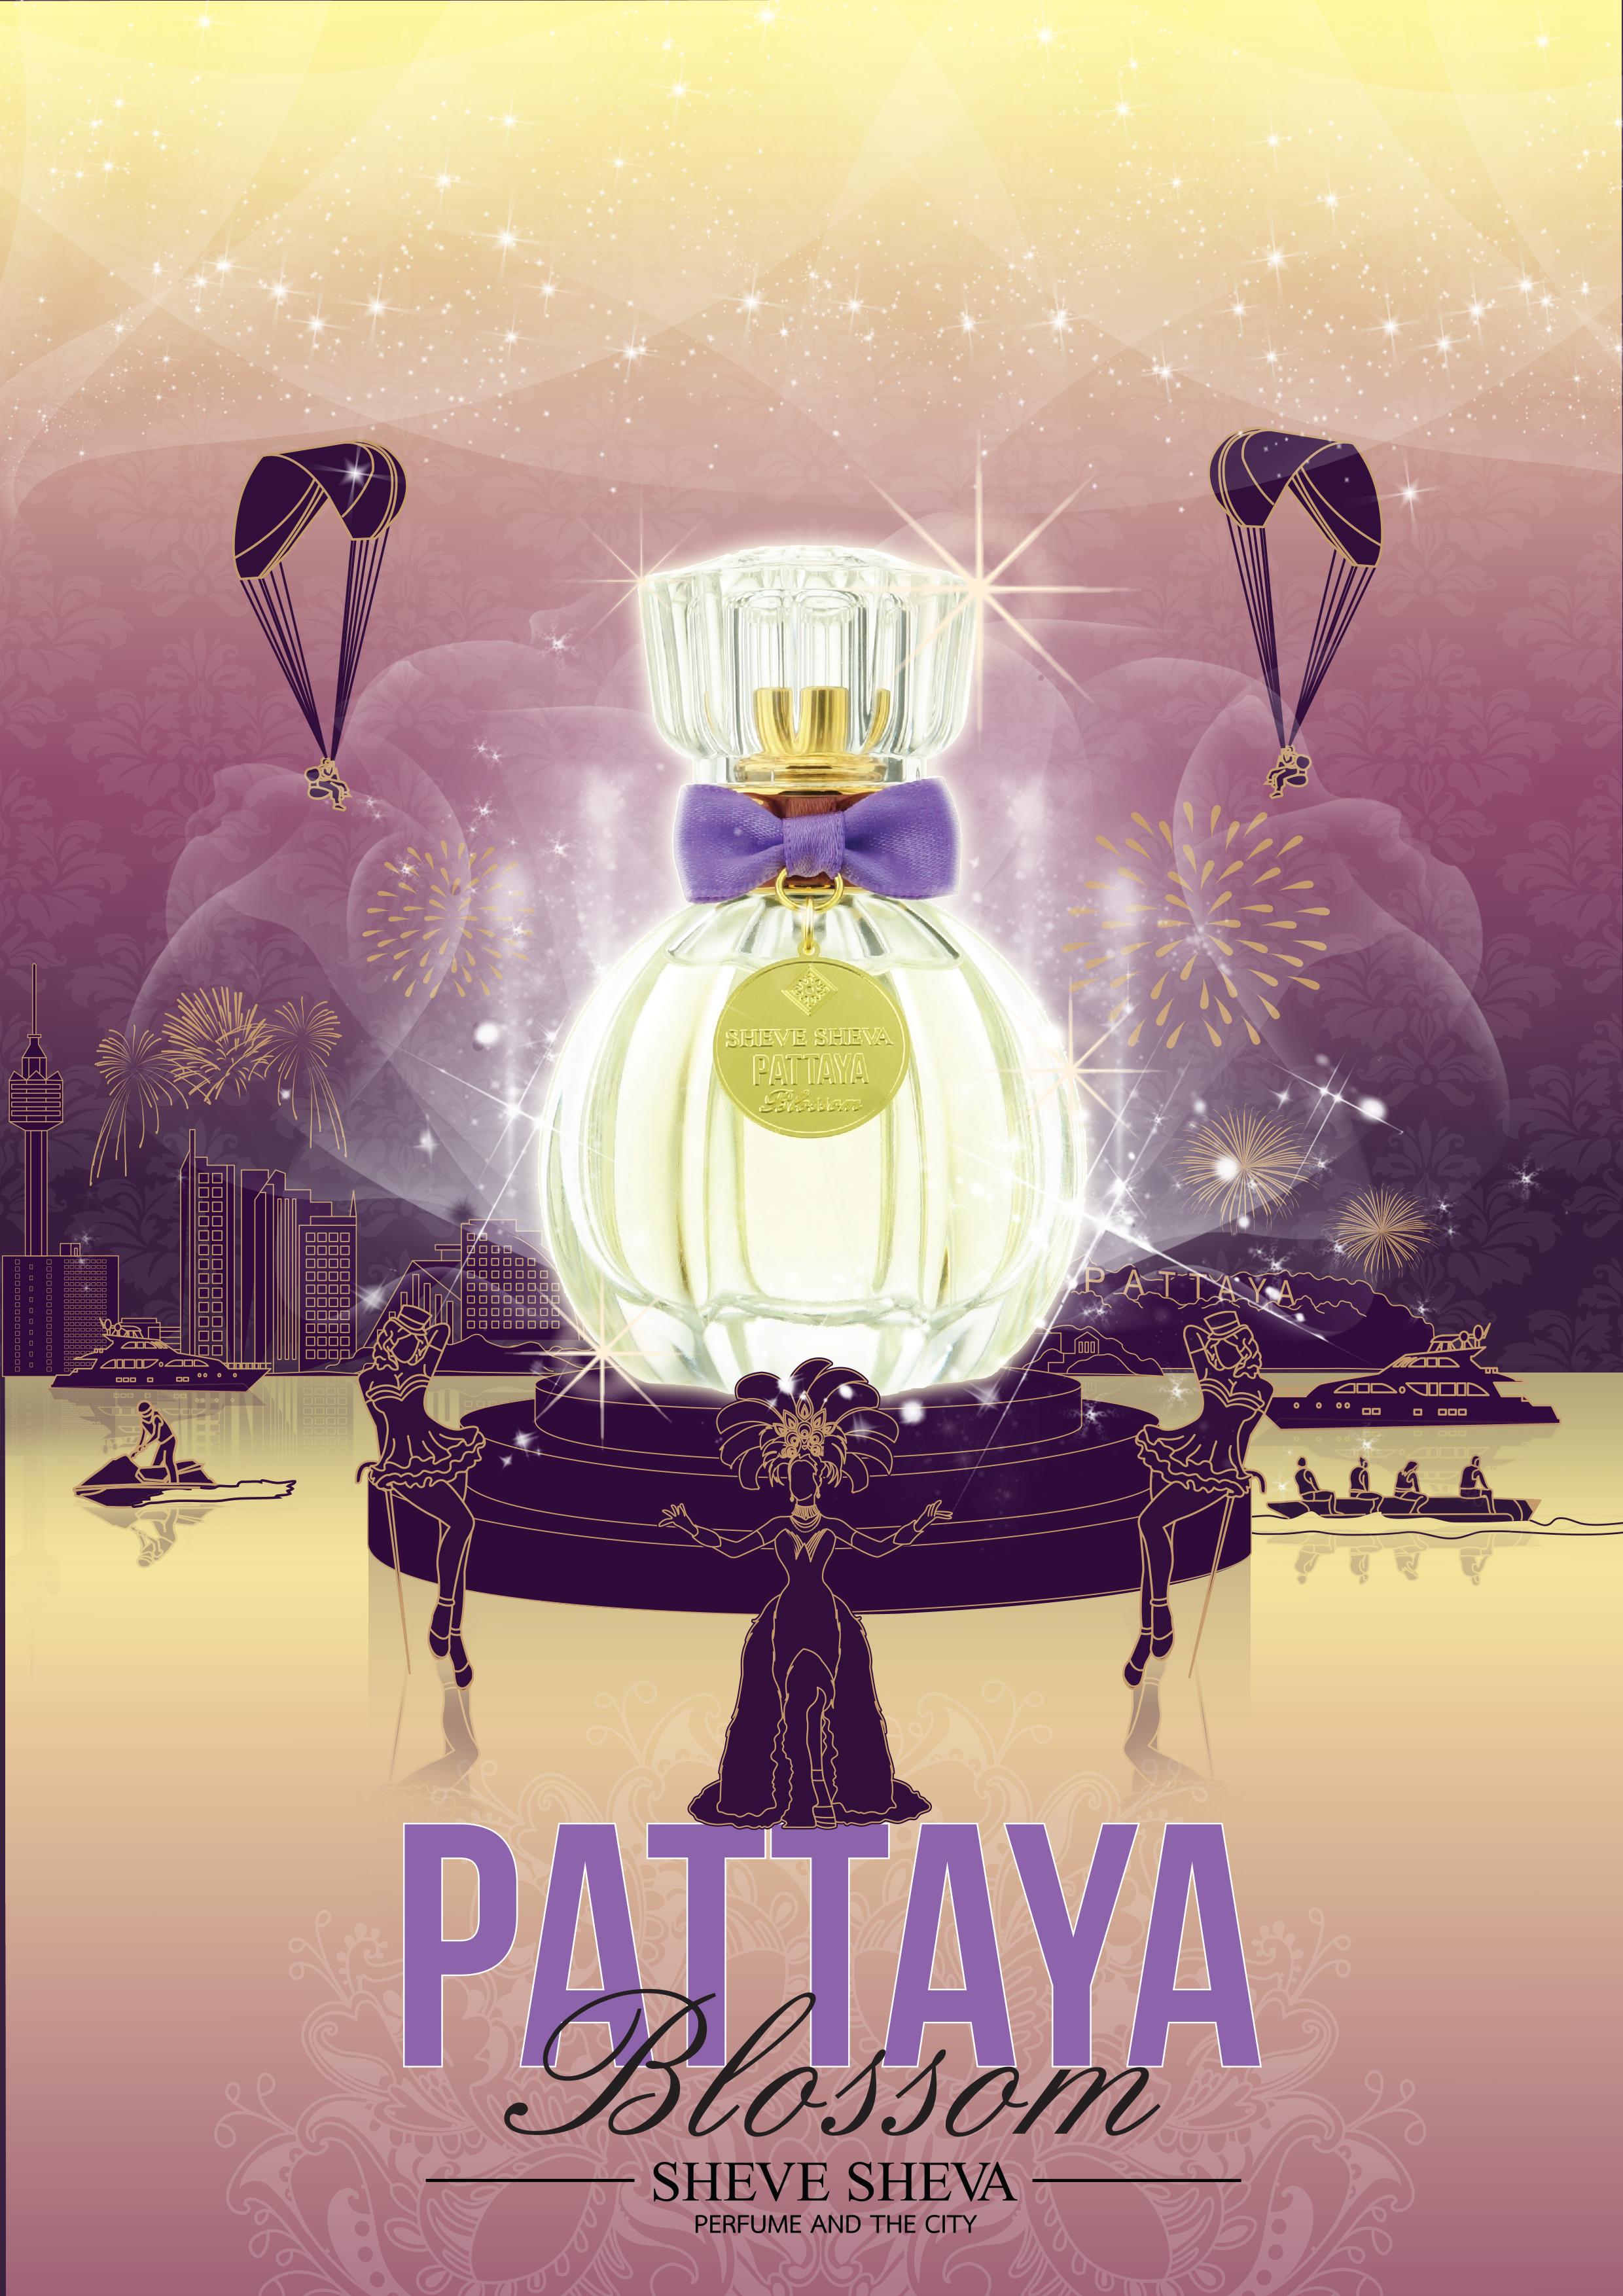 SCENT OF PATTAYA